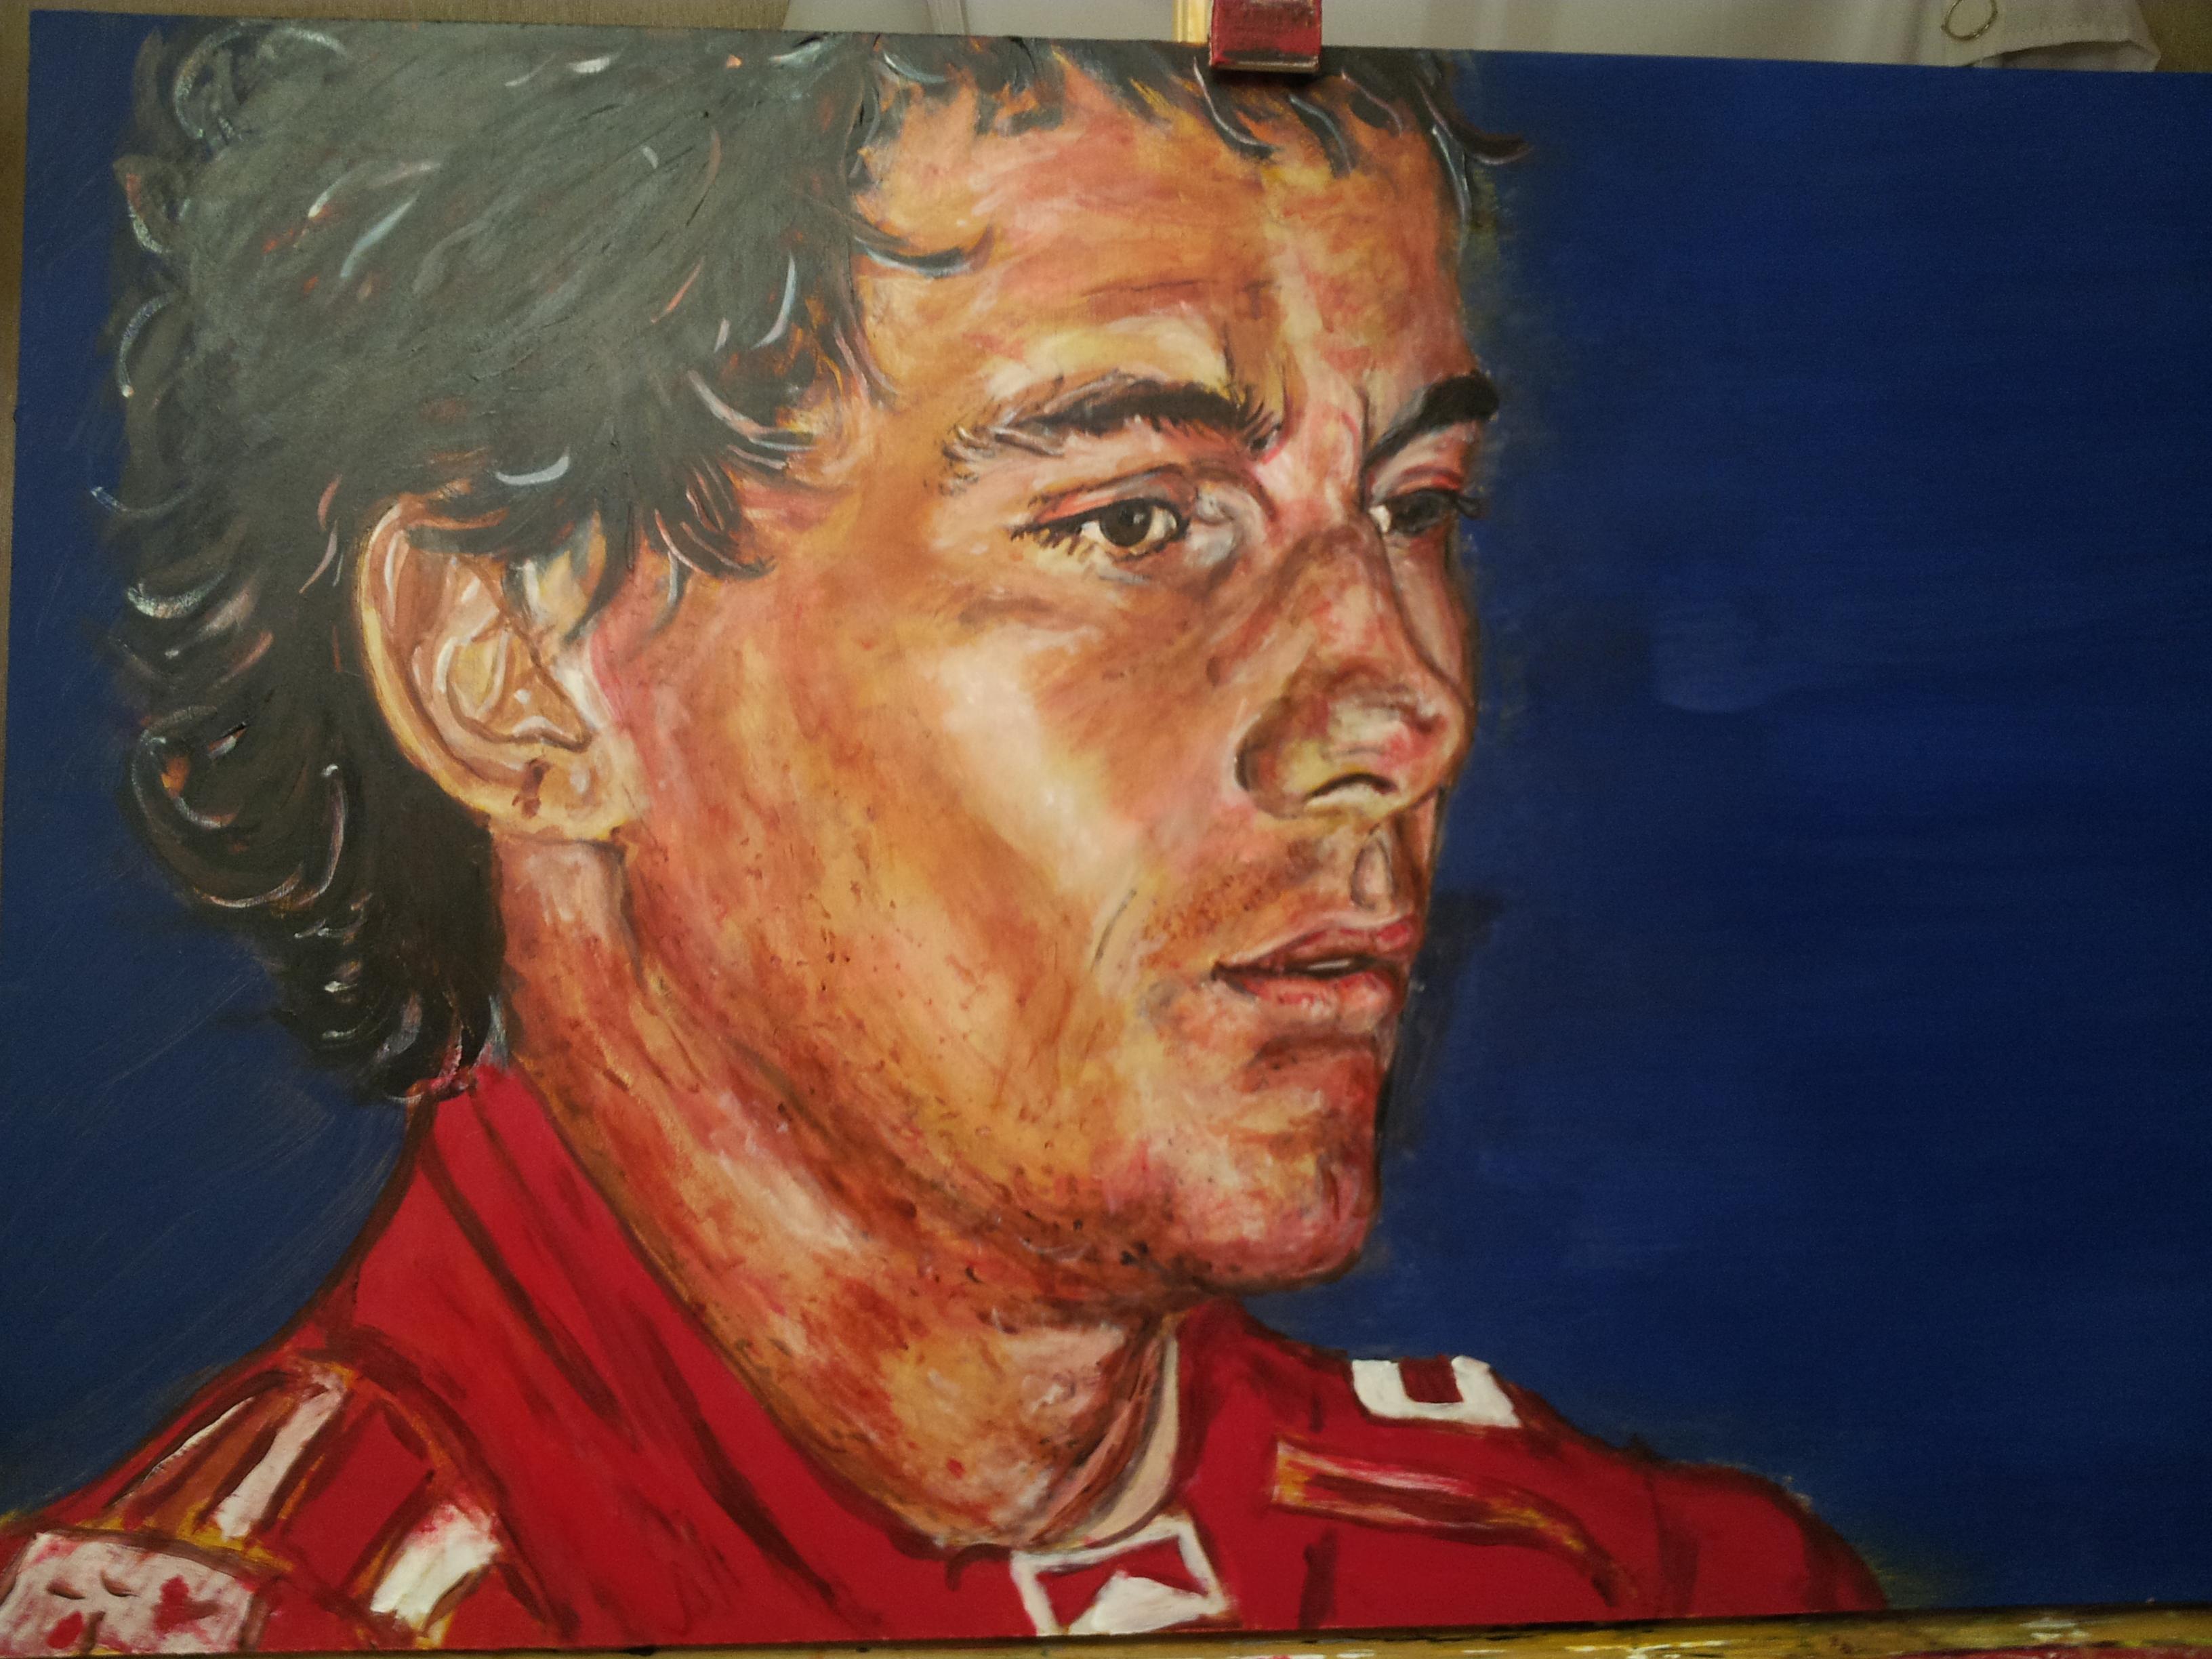 Tribute to Ayrton Senna